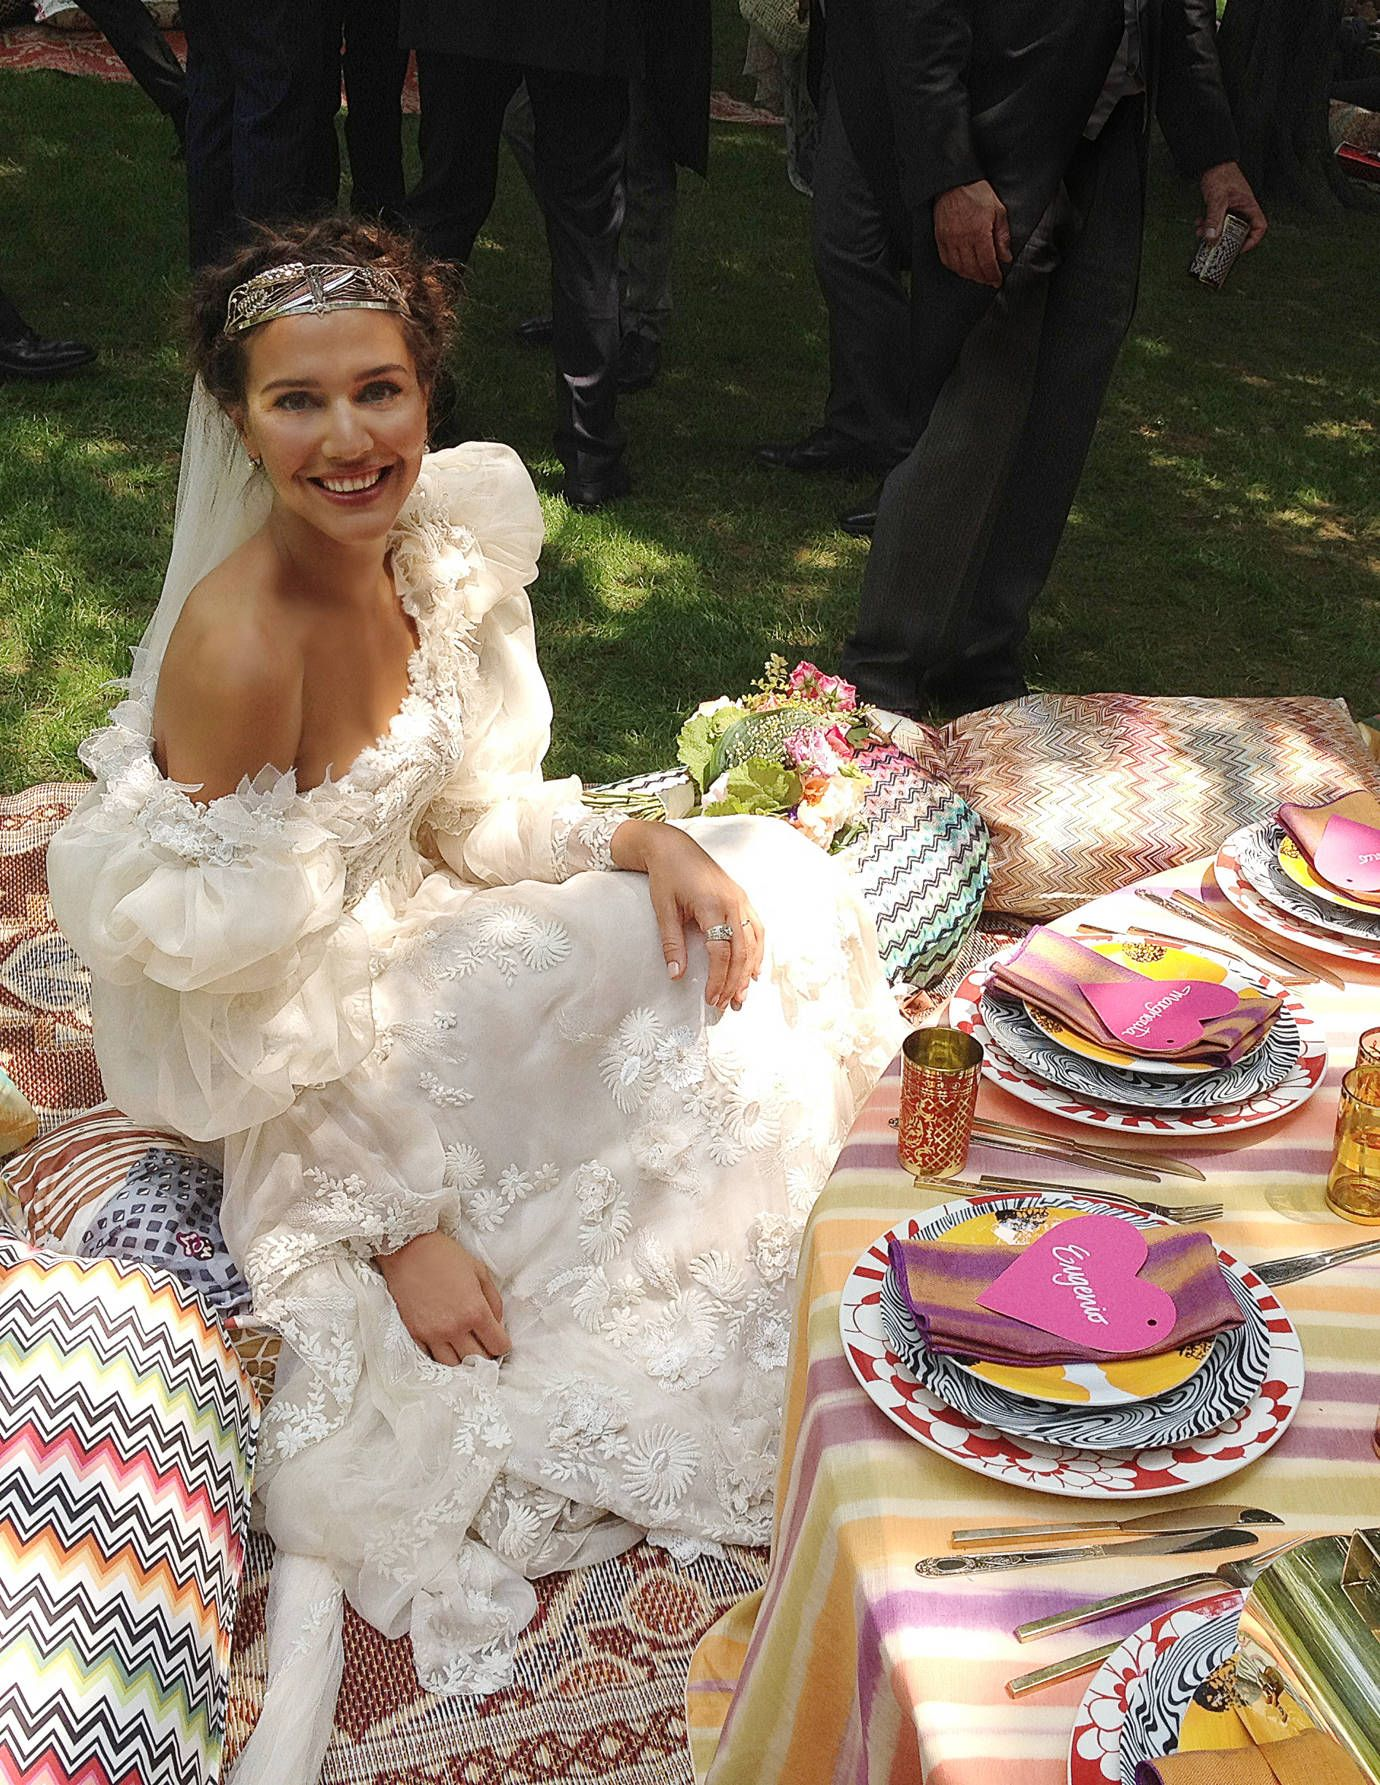 https://hips.hearstapps.com/toc.h-cdn.co/assets/cm/14/37/540fe526b3c67_-_tcx-margherita-missoni-wedding-1012-lg.jpg